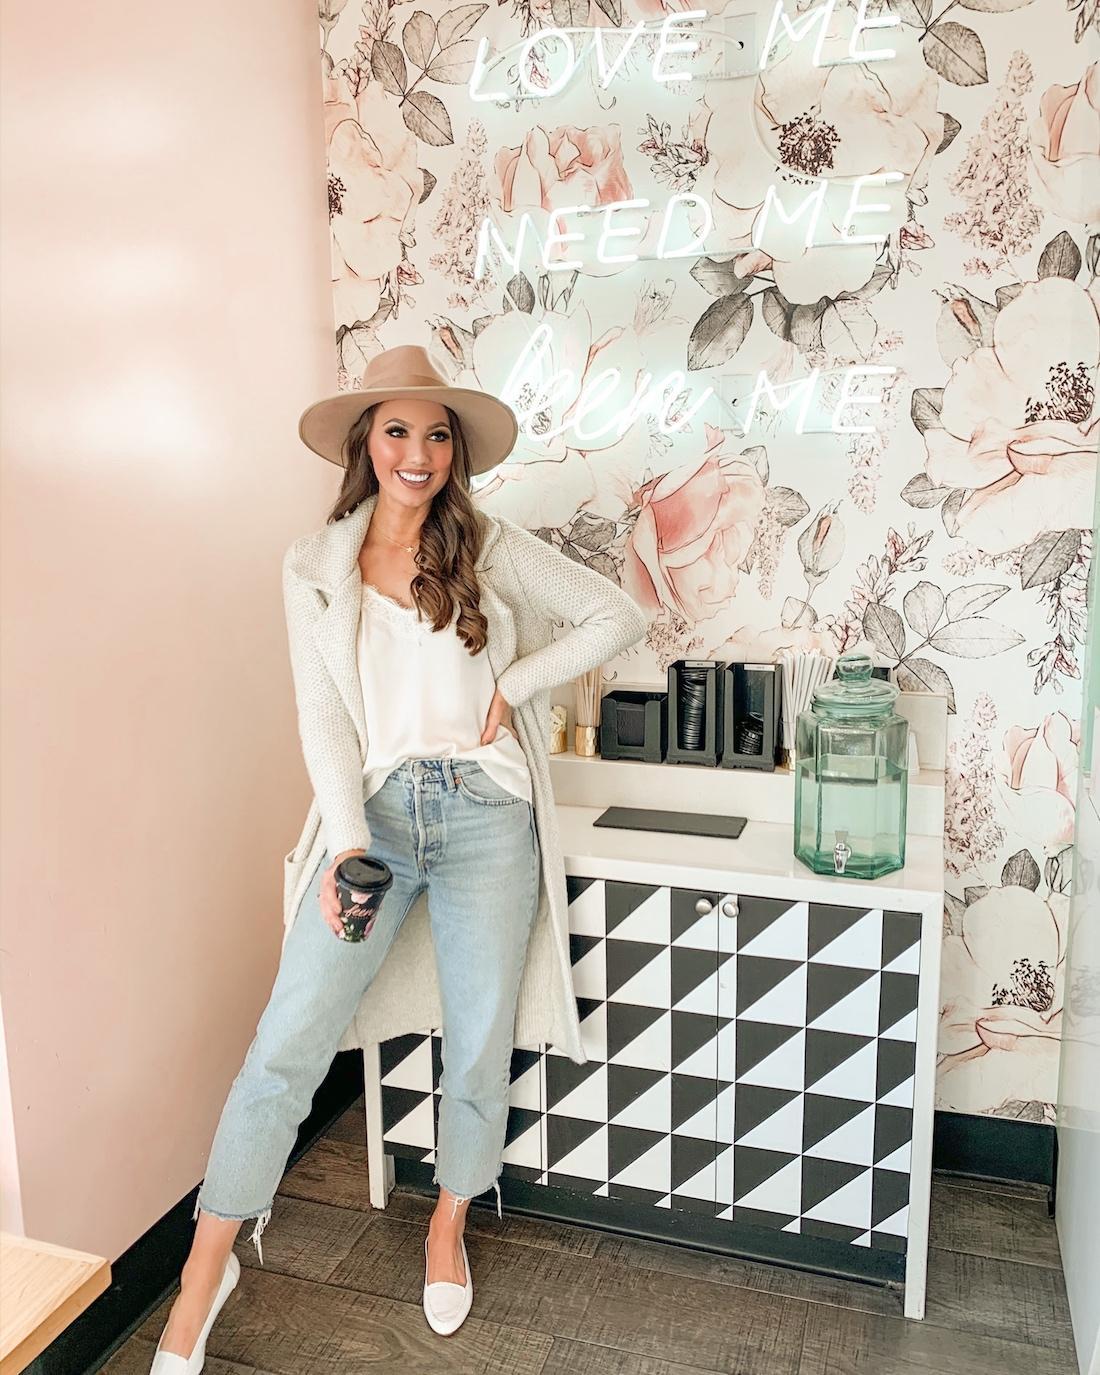 instagrammable coffee shop in orange county